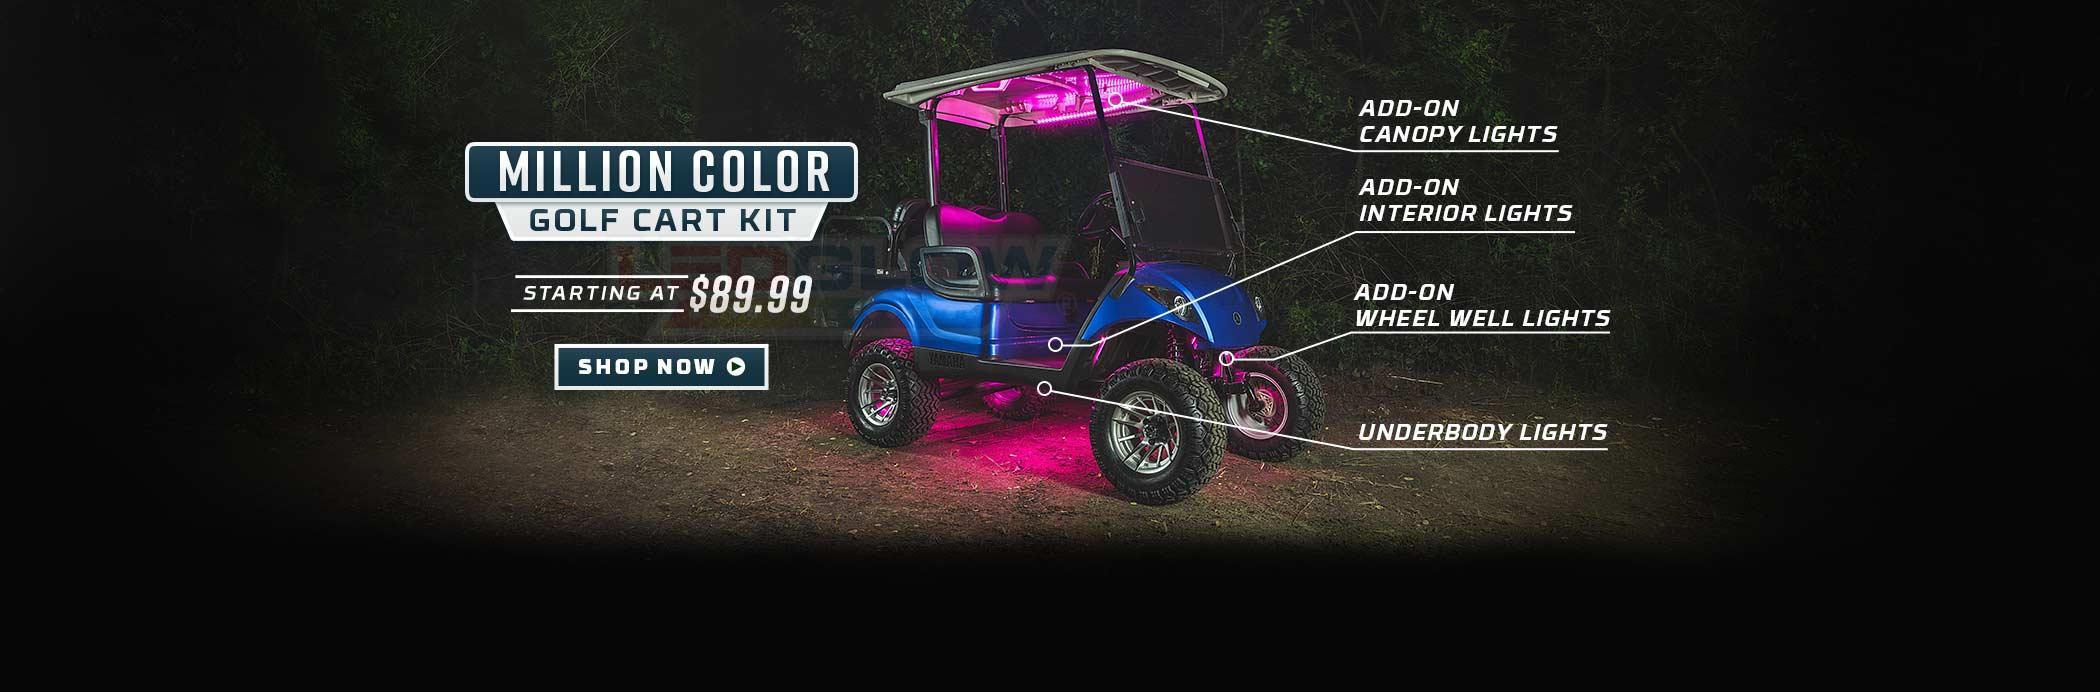 Million Color Golf Cart Underglow Lights